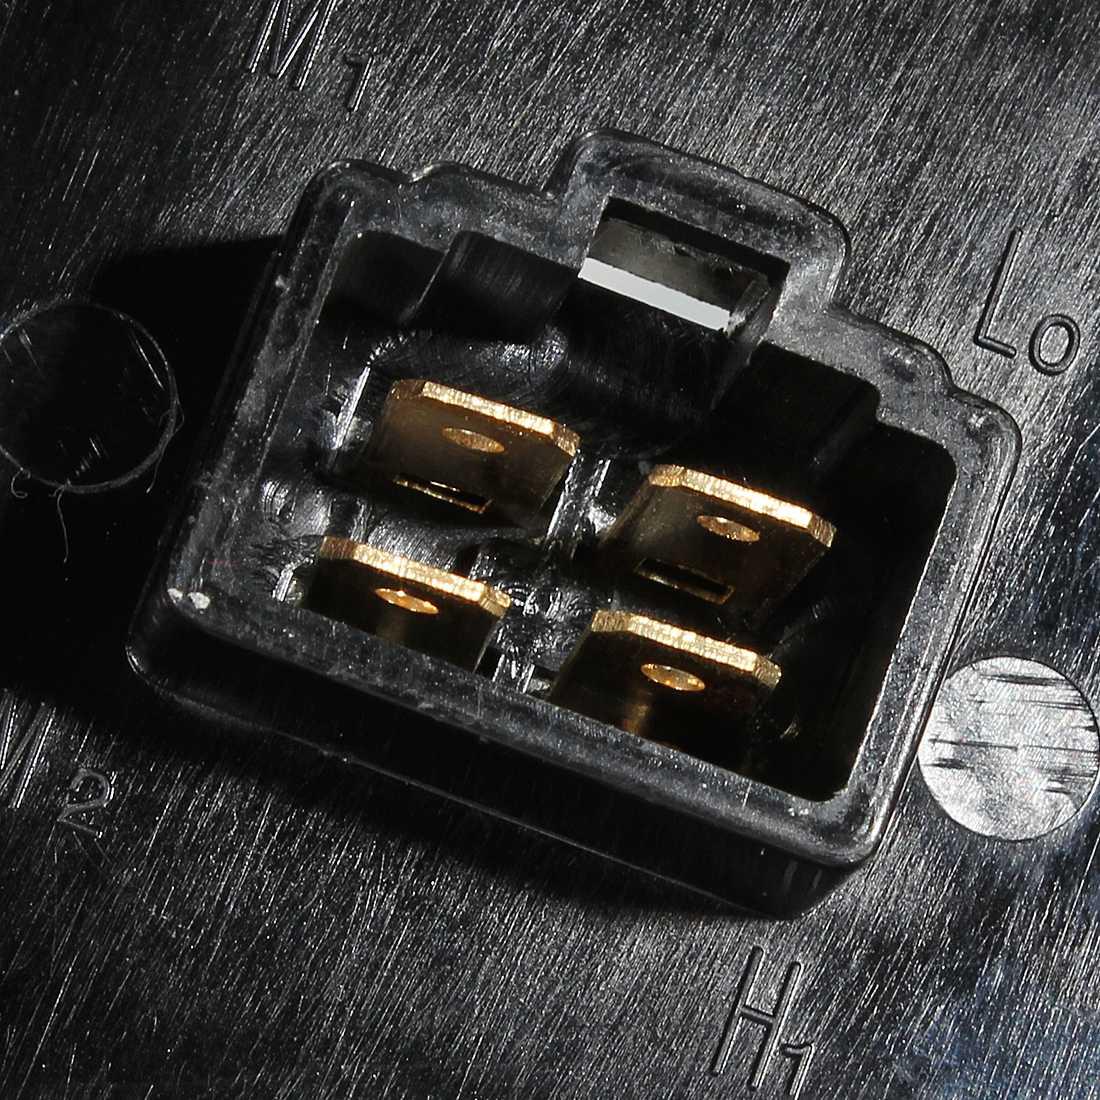 Rover 45 MG ZS 400 1995 en la perilla de Control Calentador Interruptor